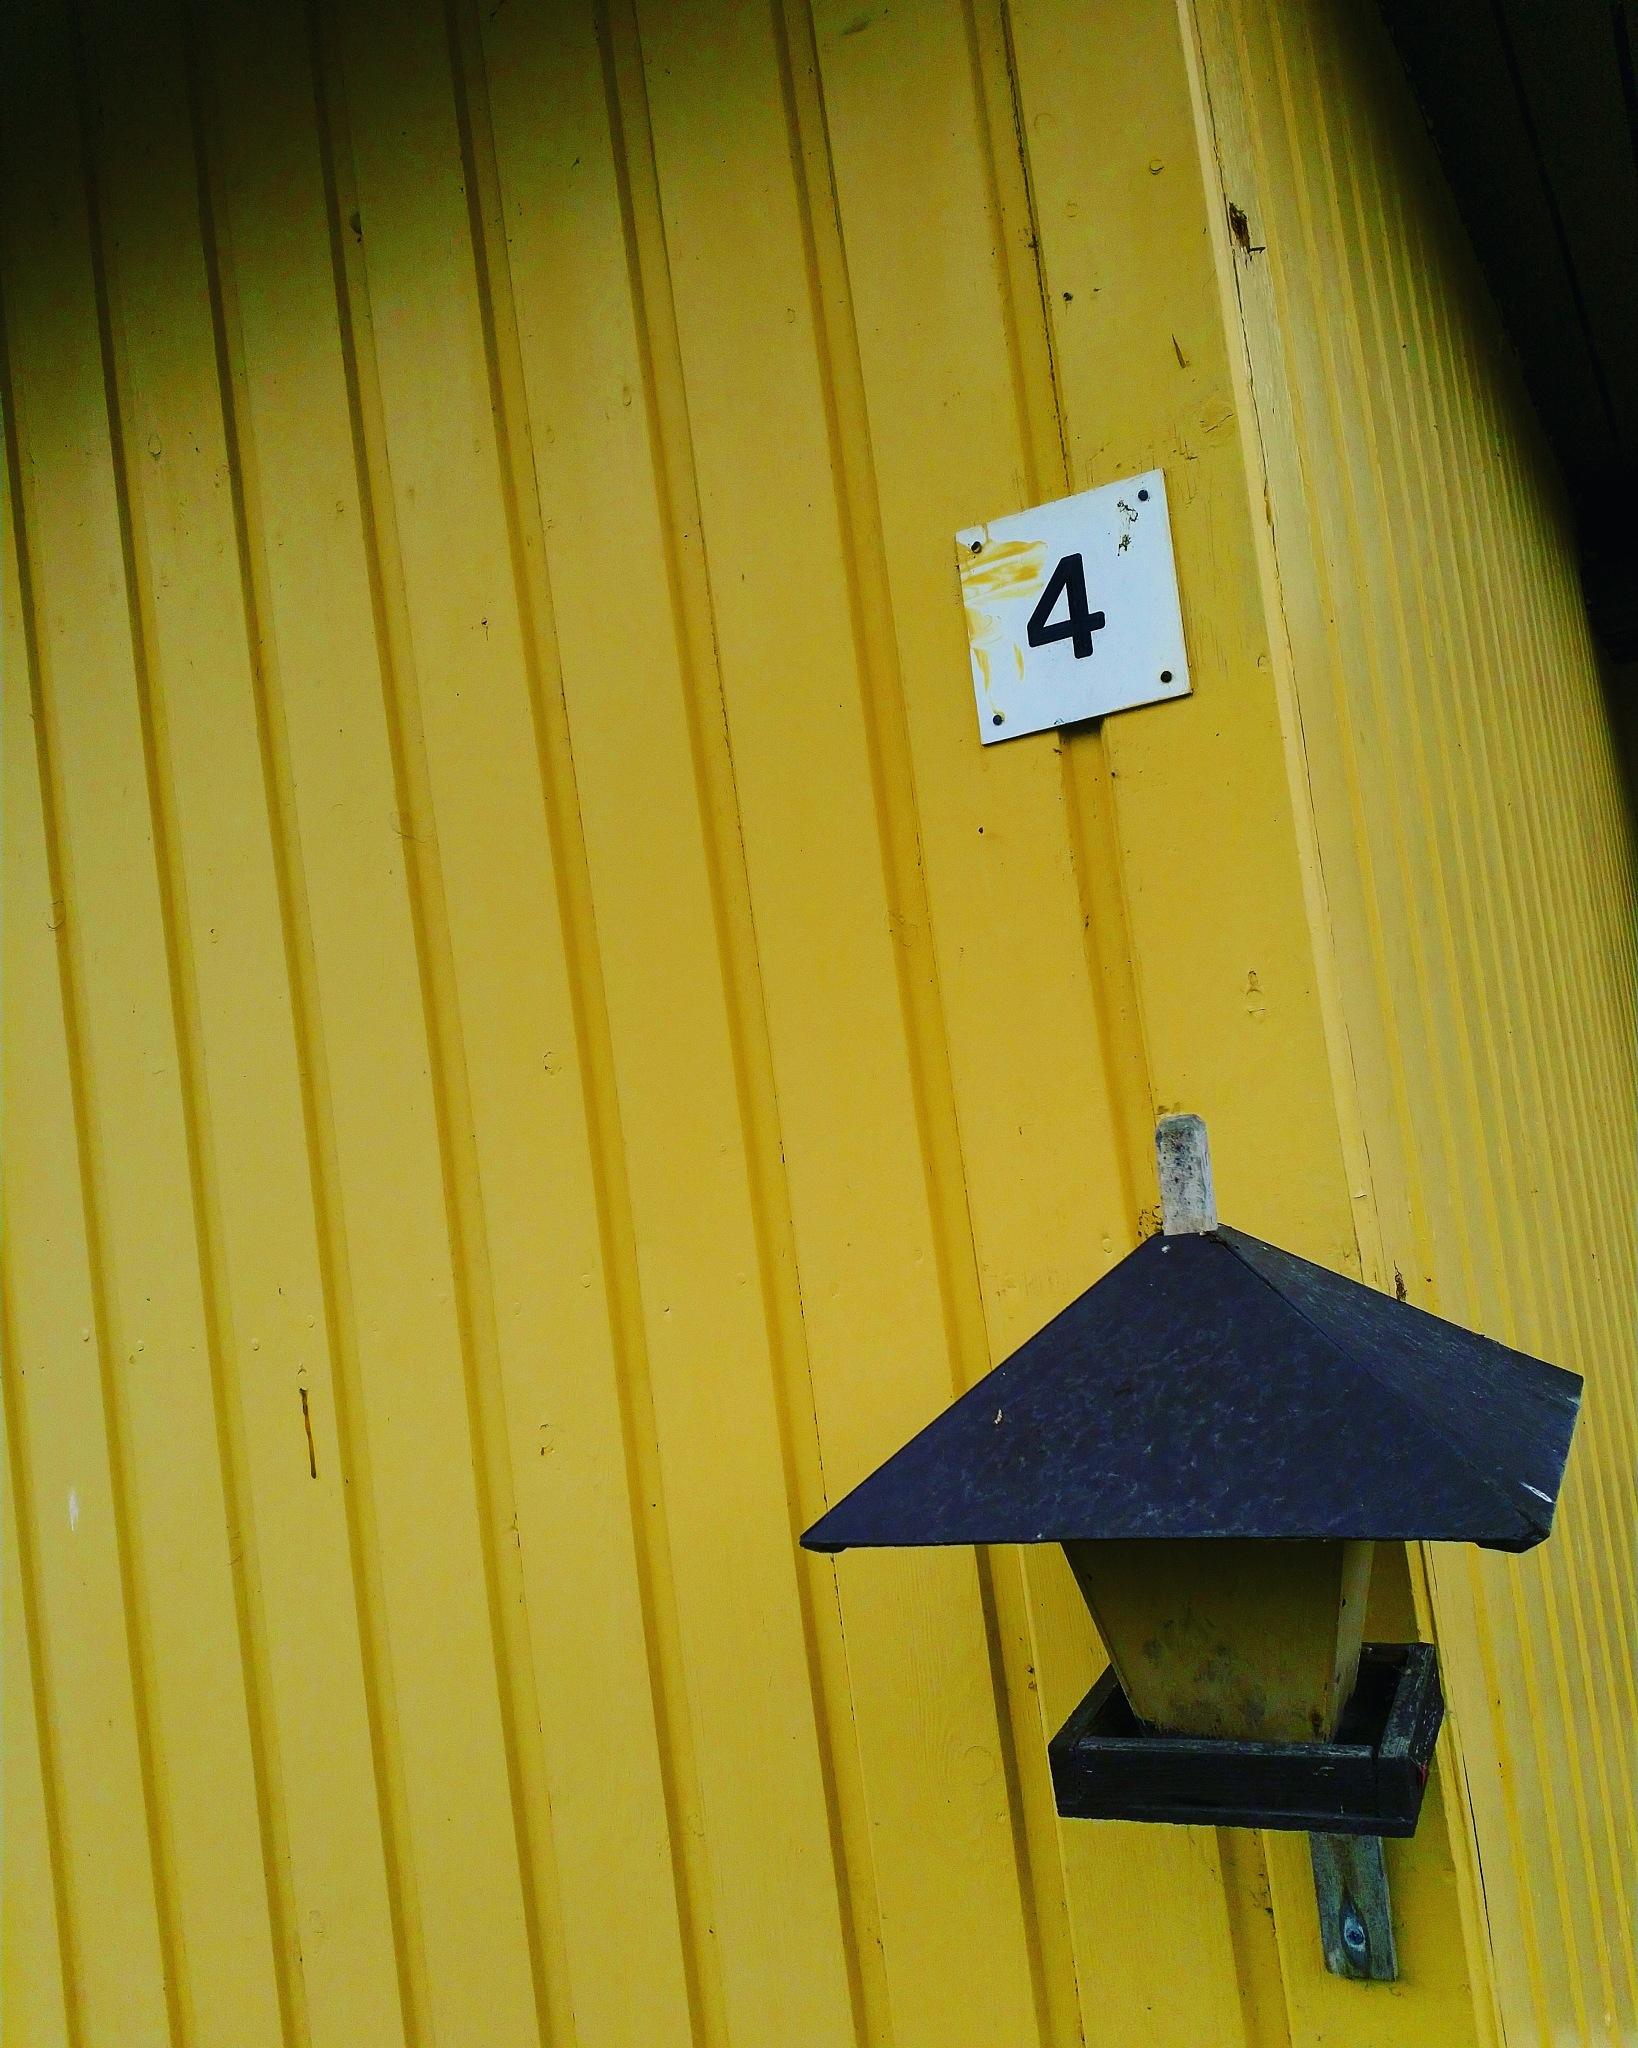 4 by Janne Karvonen